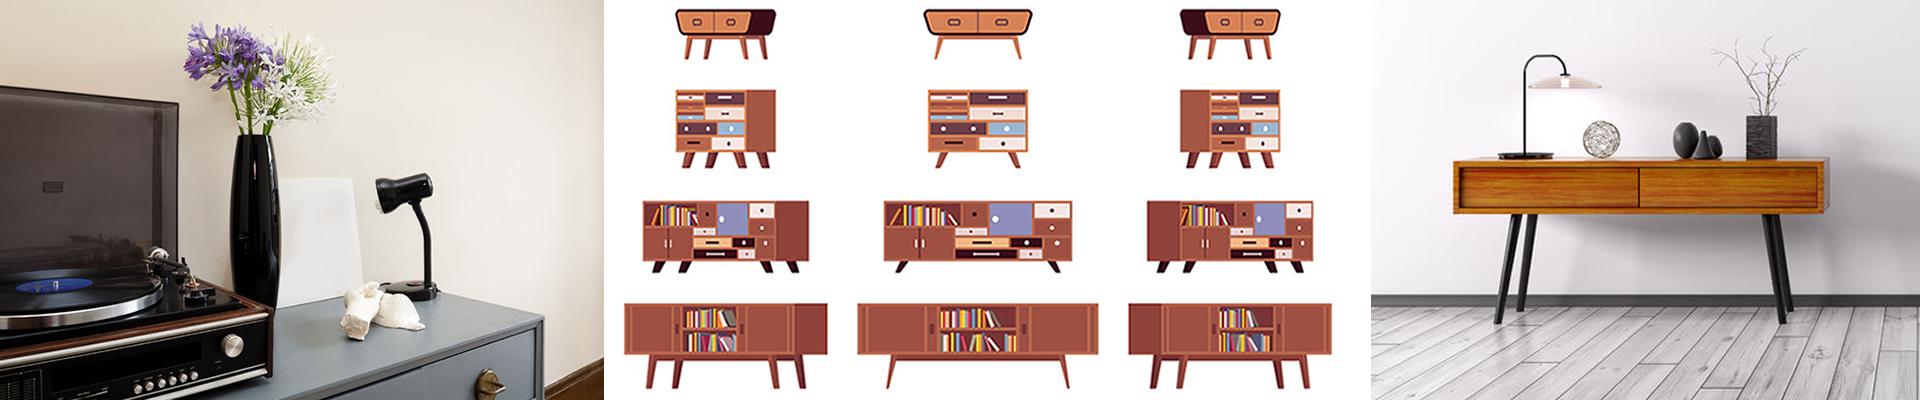 Sideboards   Wooden & Coloured Sideboards